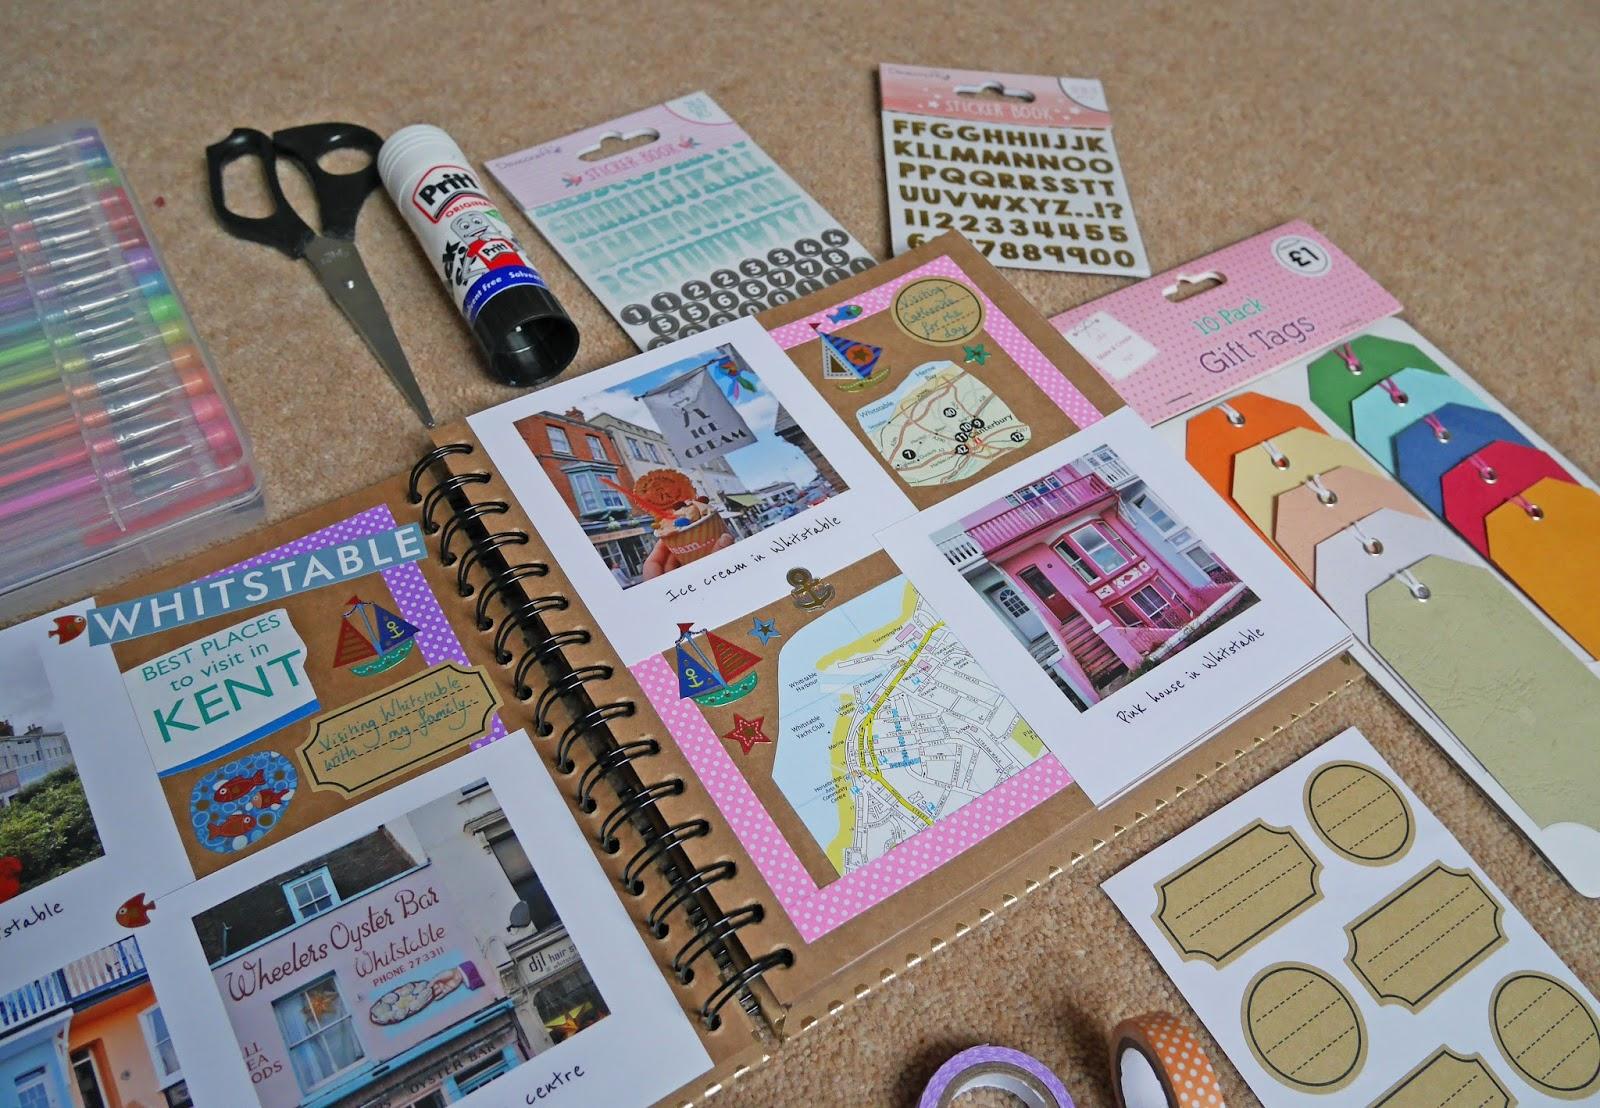 Scrapbooking starter kit for beginners | Kat Last - A ...